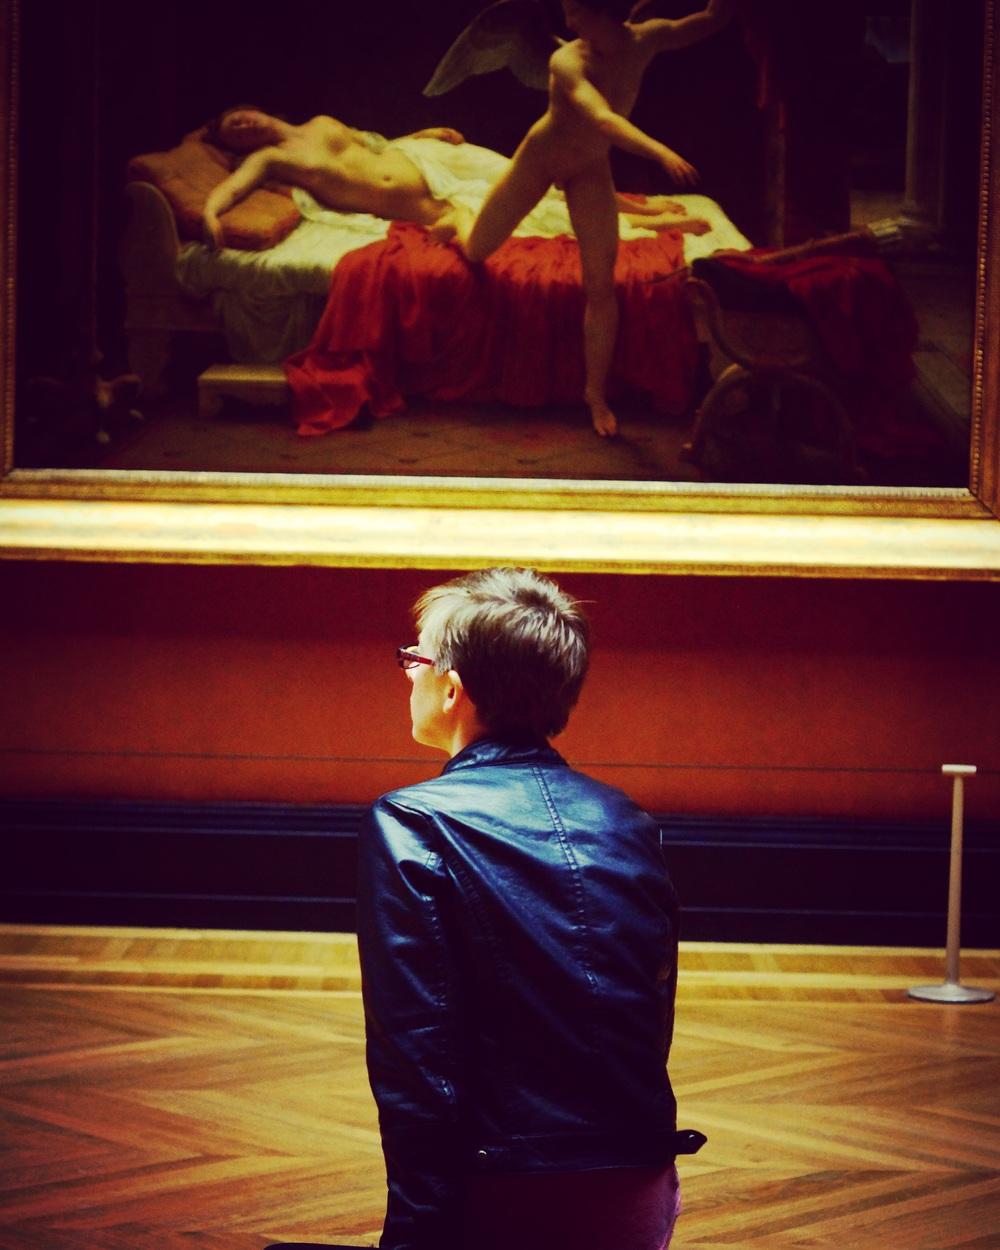 Louvre museum--Paris